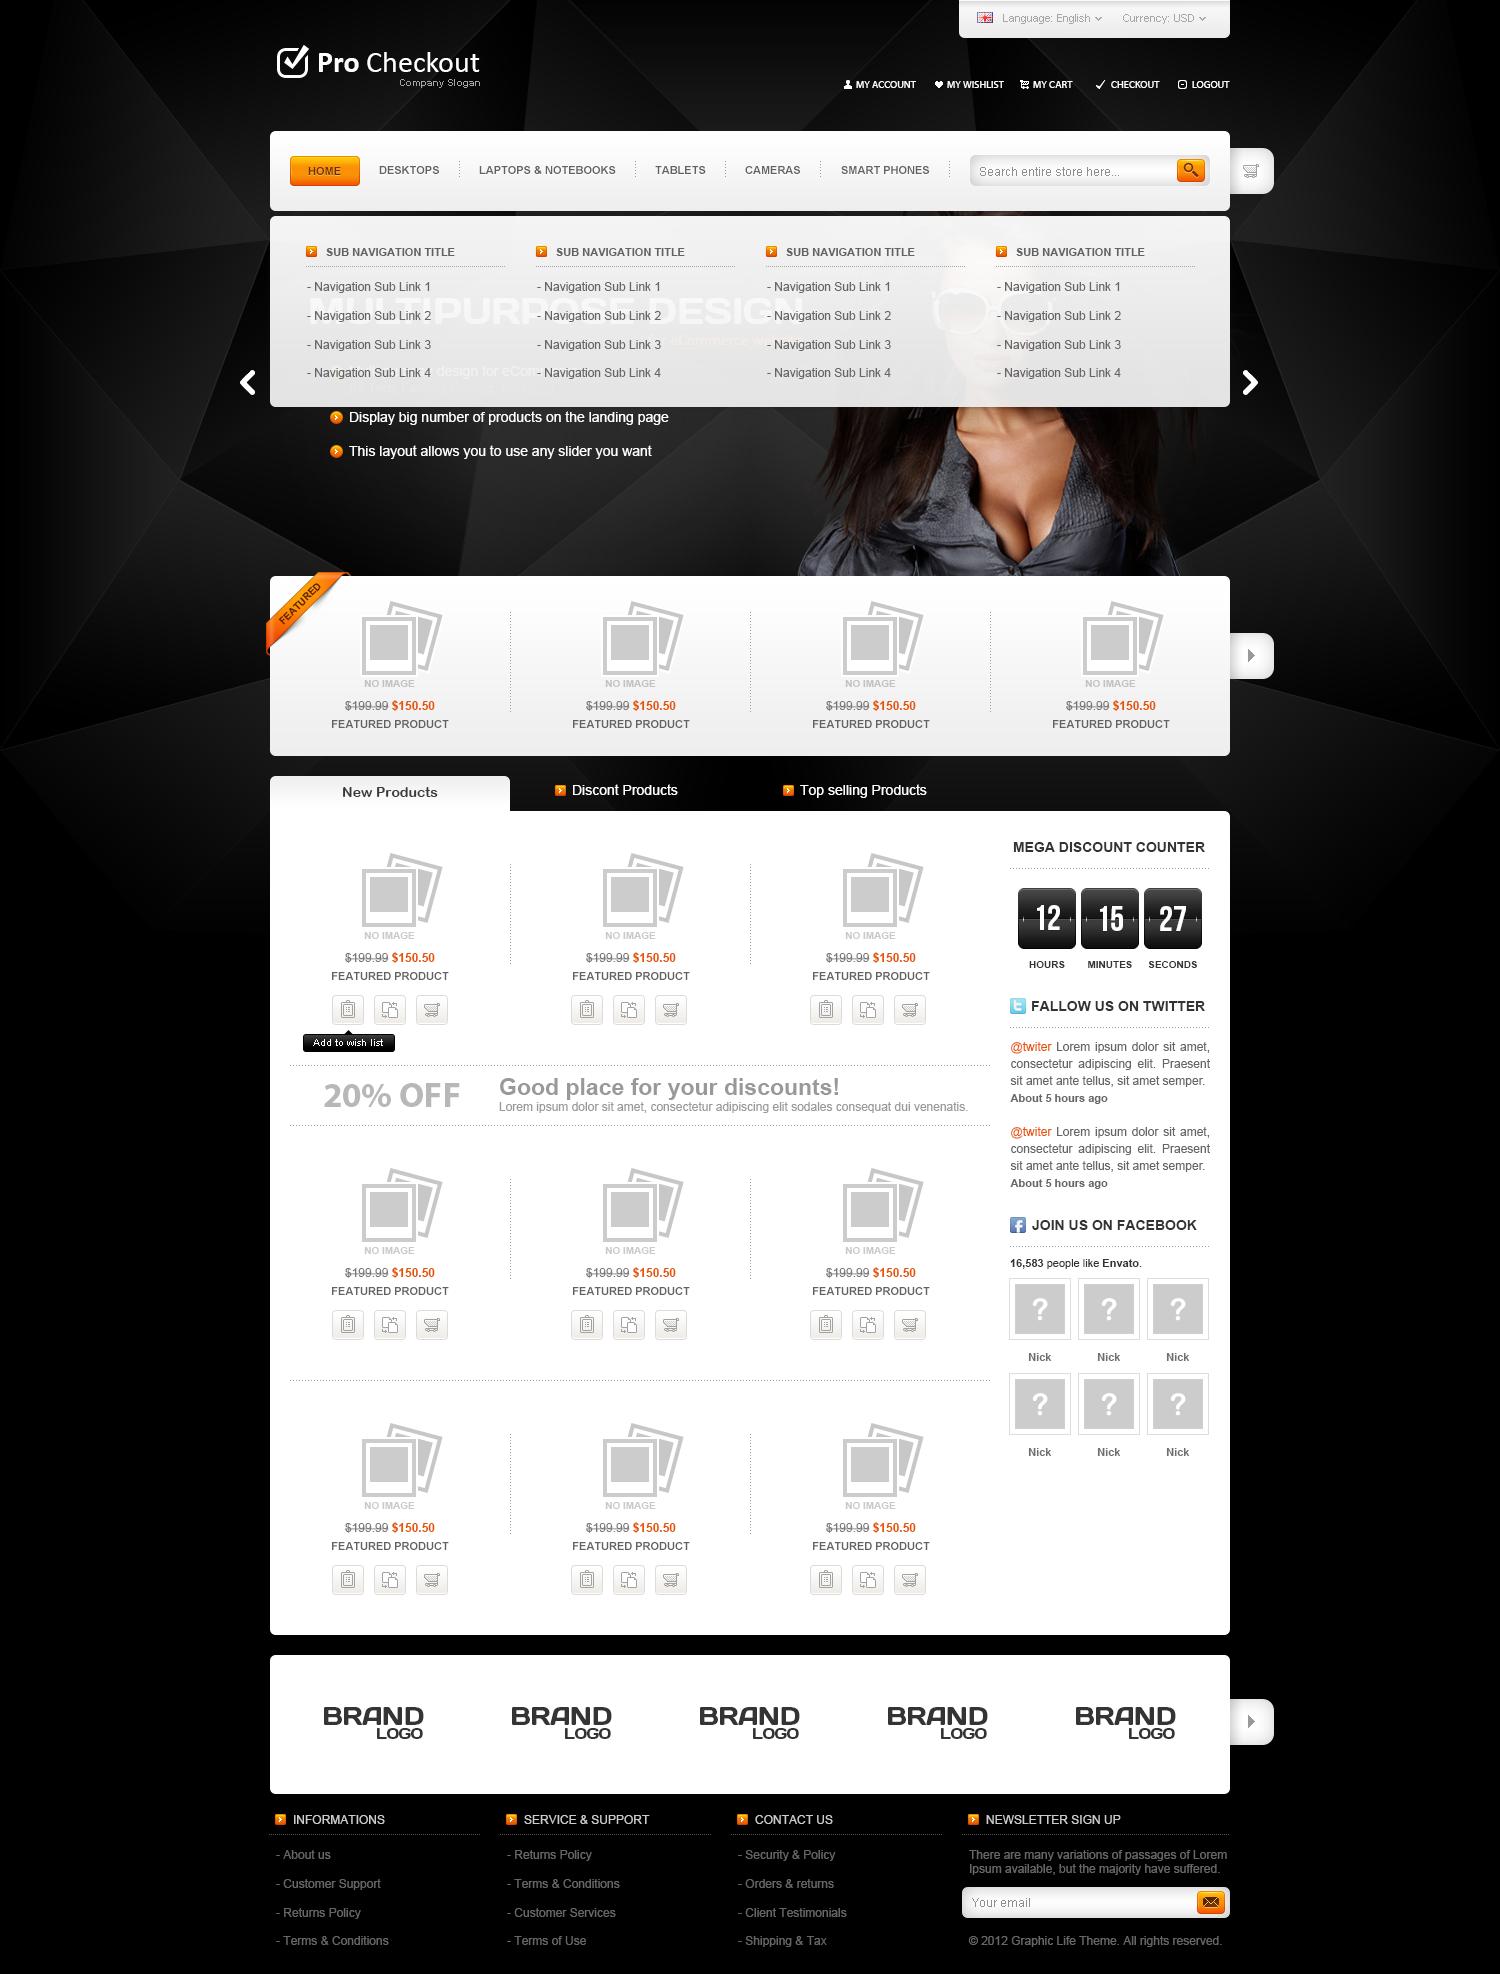 Pro Checkout - eCommerce PSD Template